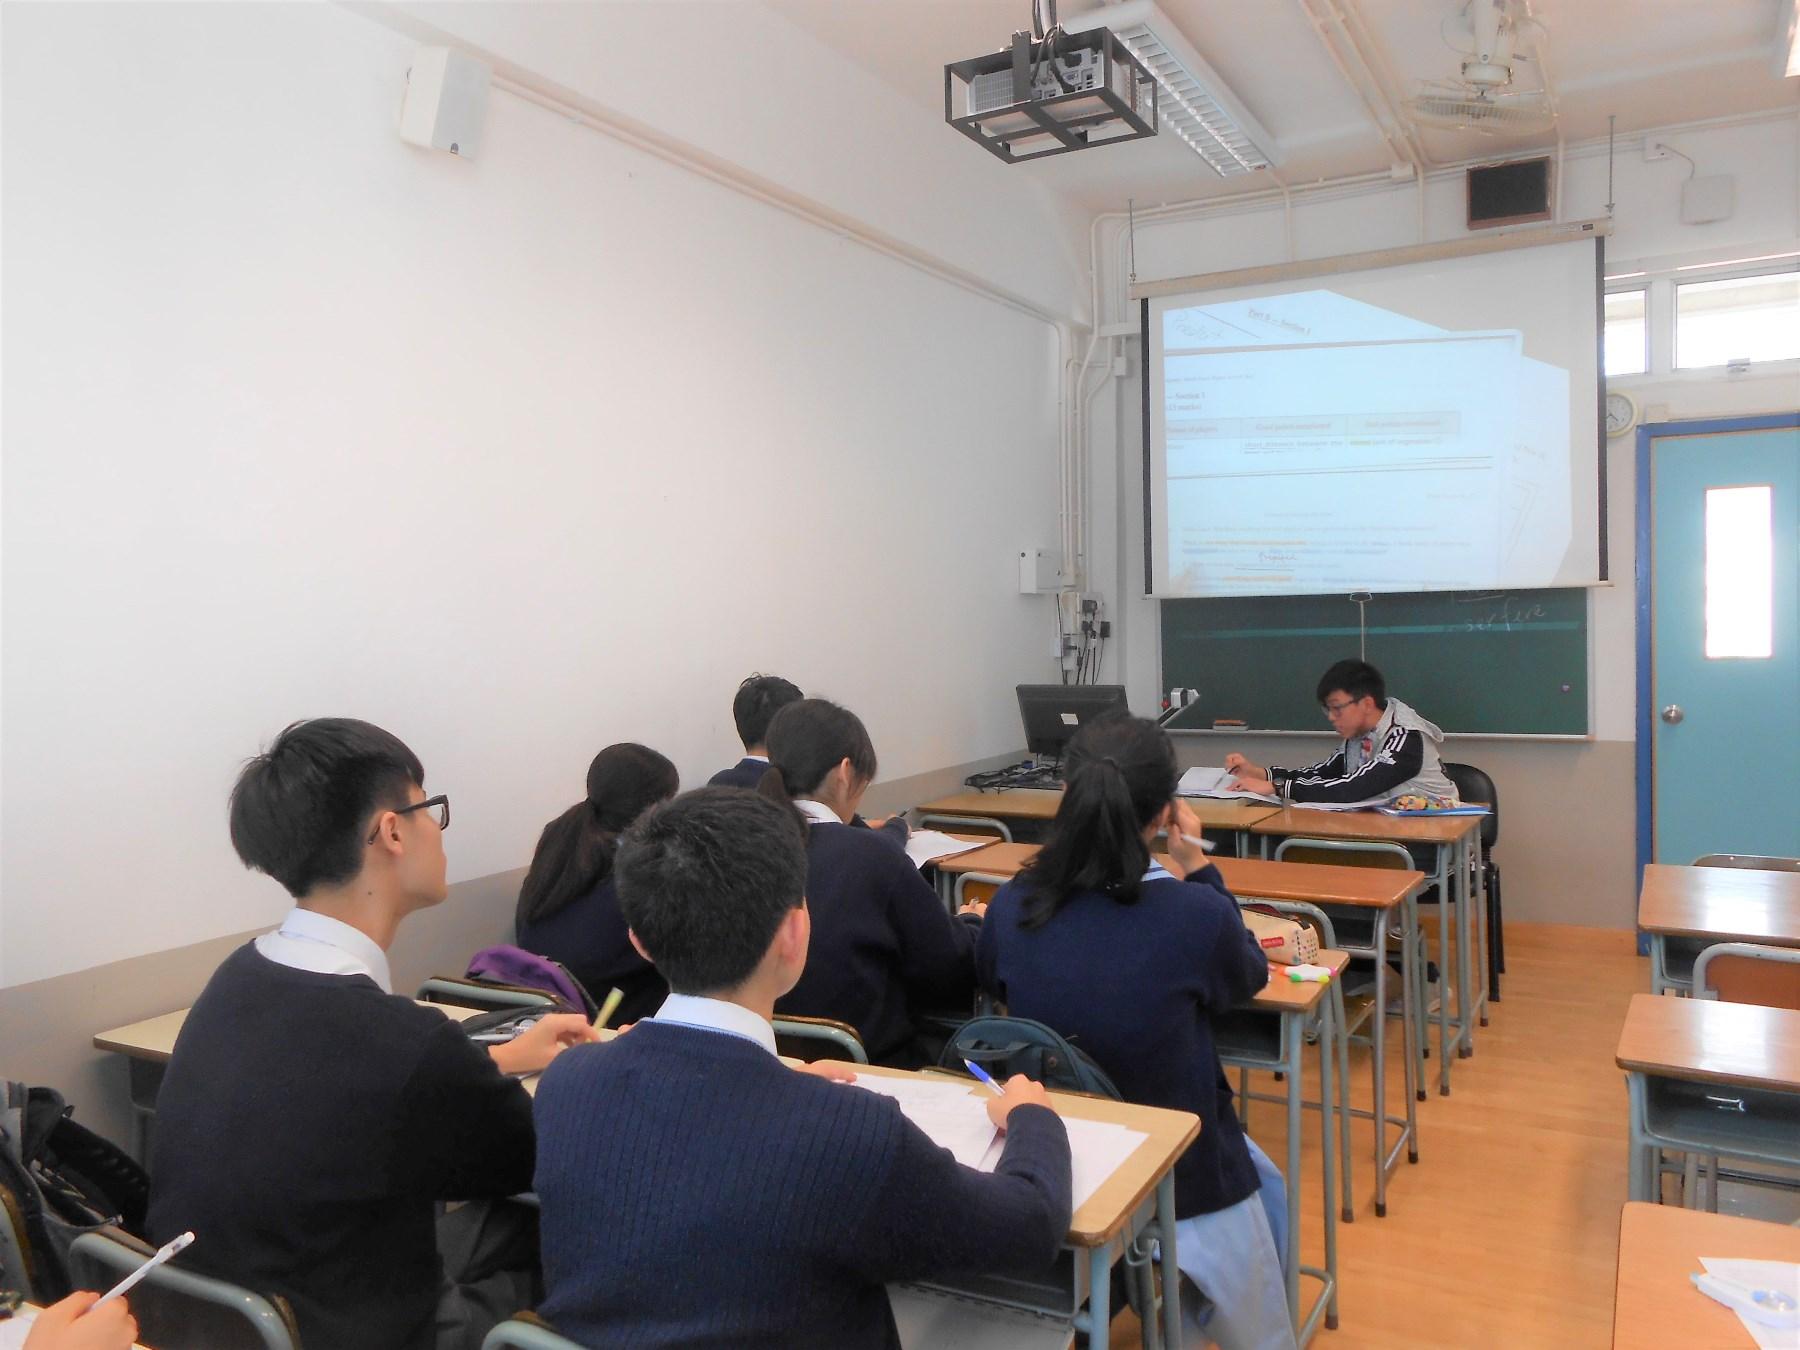 http://npc.edu.hk/sites/default/files/dscn9874.jpg